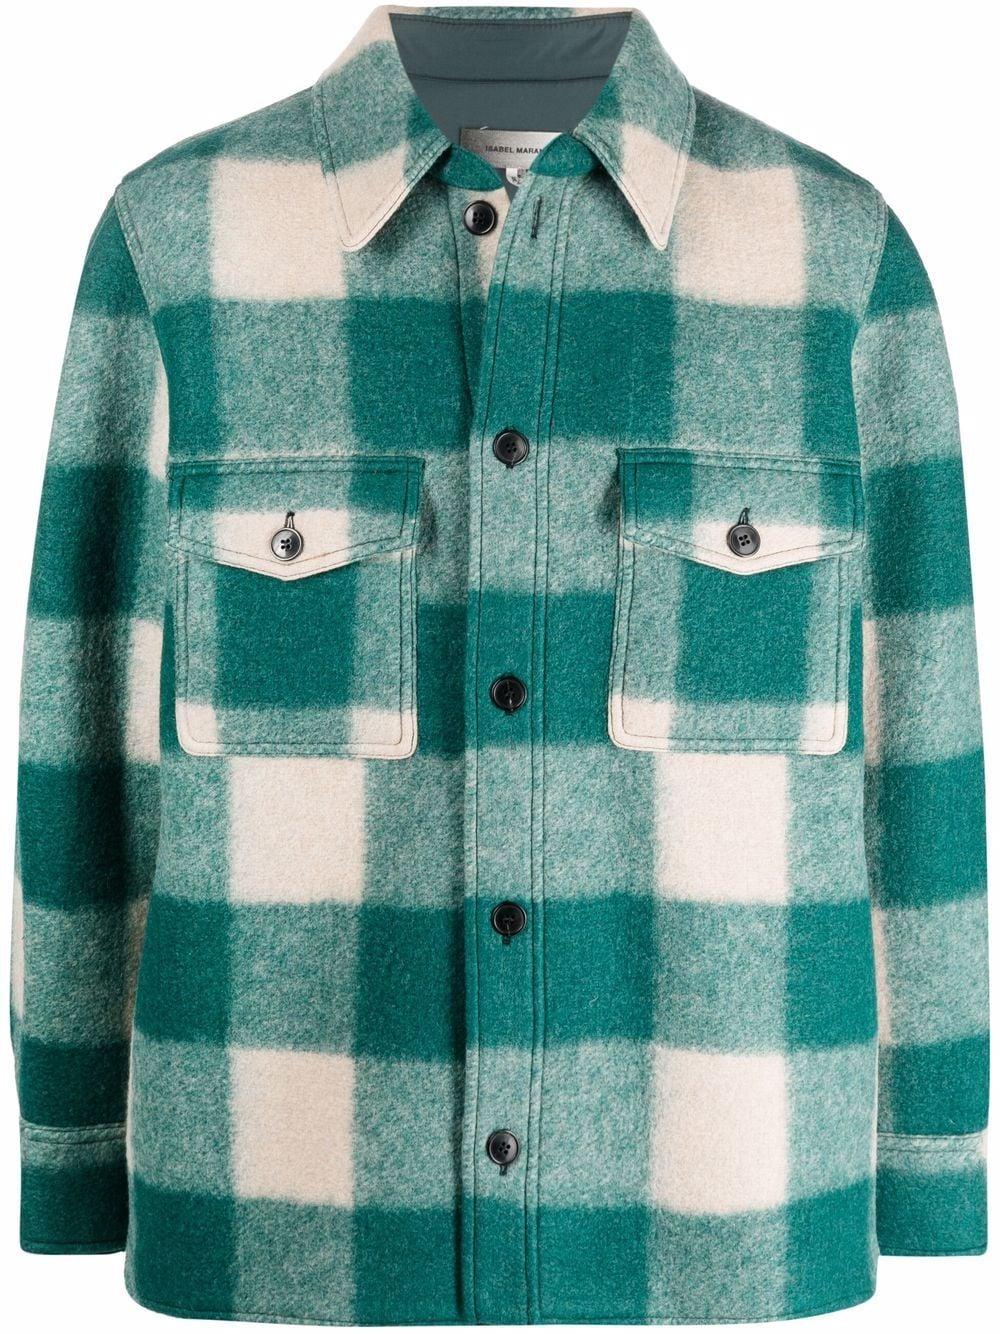 kevron jacket man green ISABEL MARANT   Coats   21AVE1623-21A008H60GR